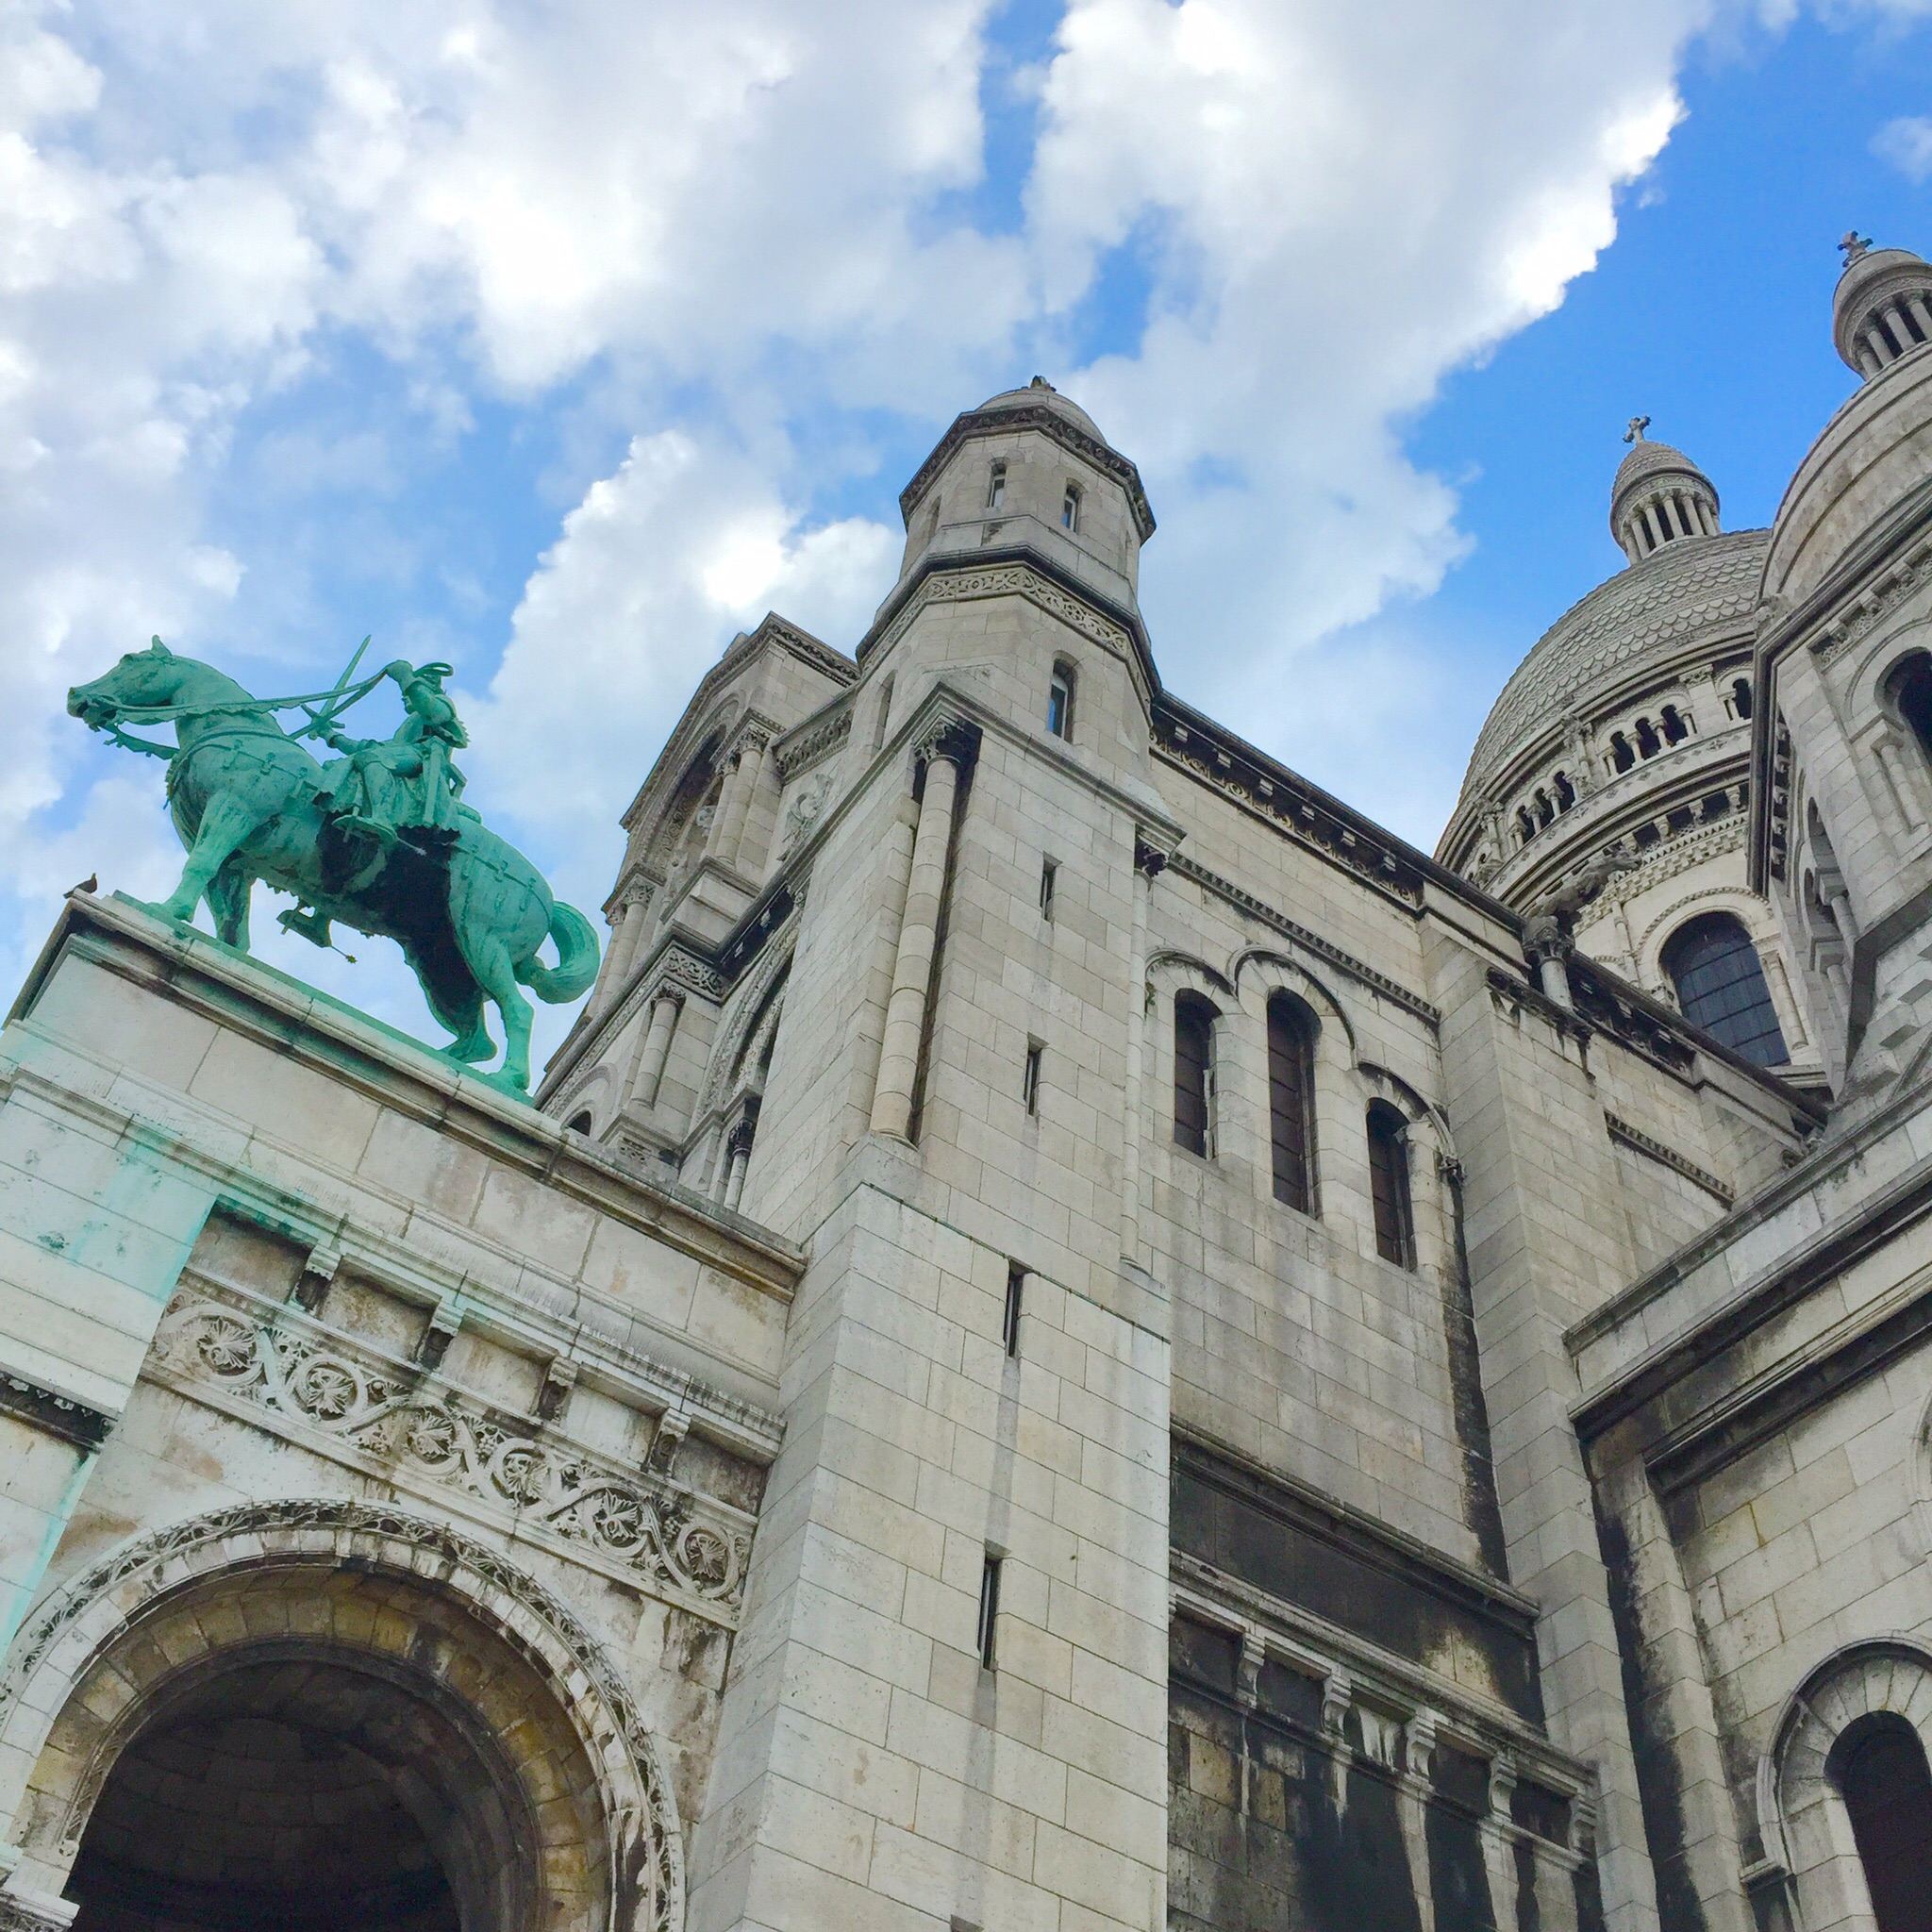 Sacre Coeur basilica on Montmartre